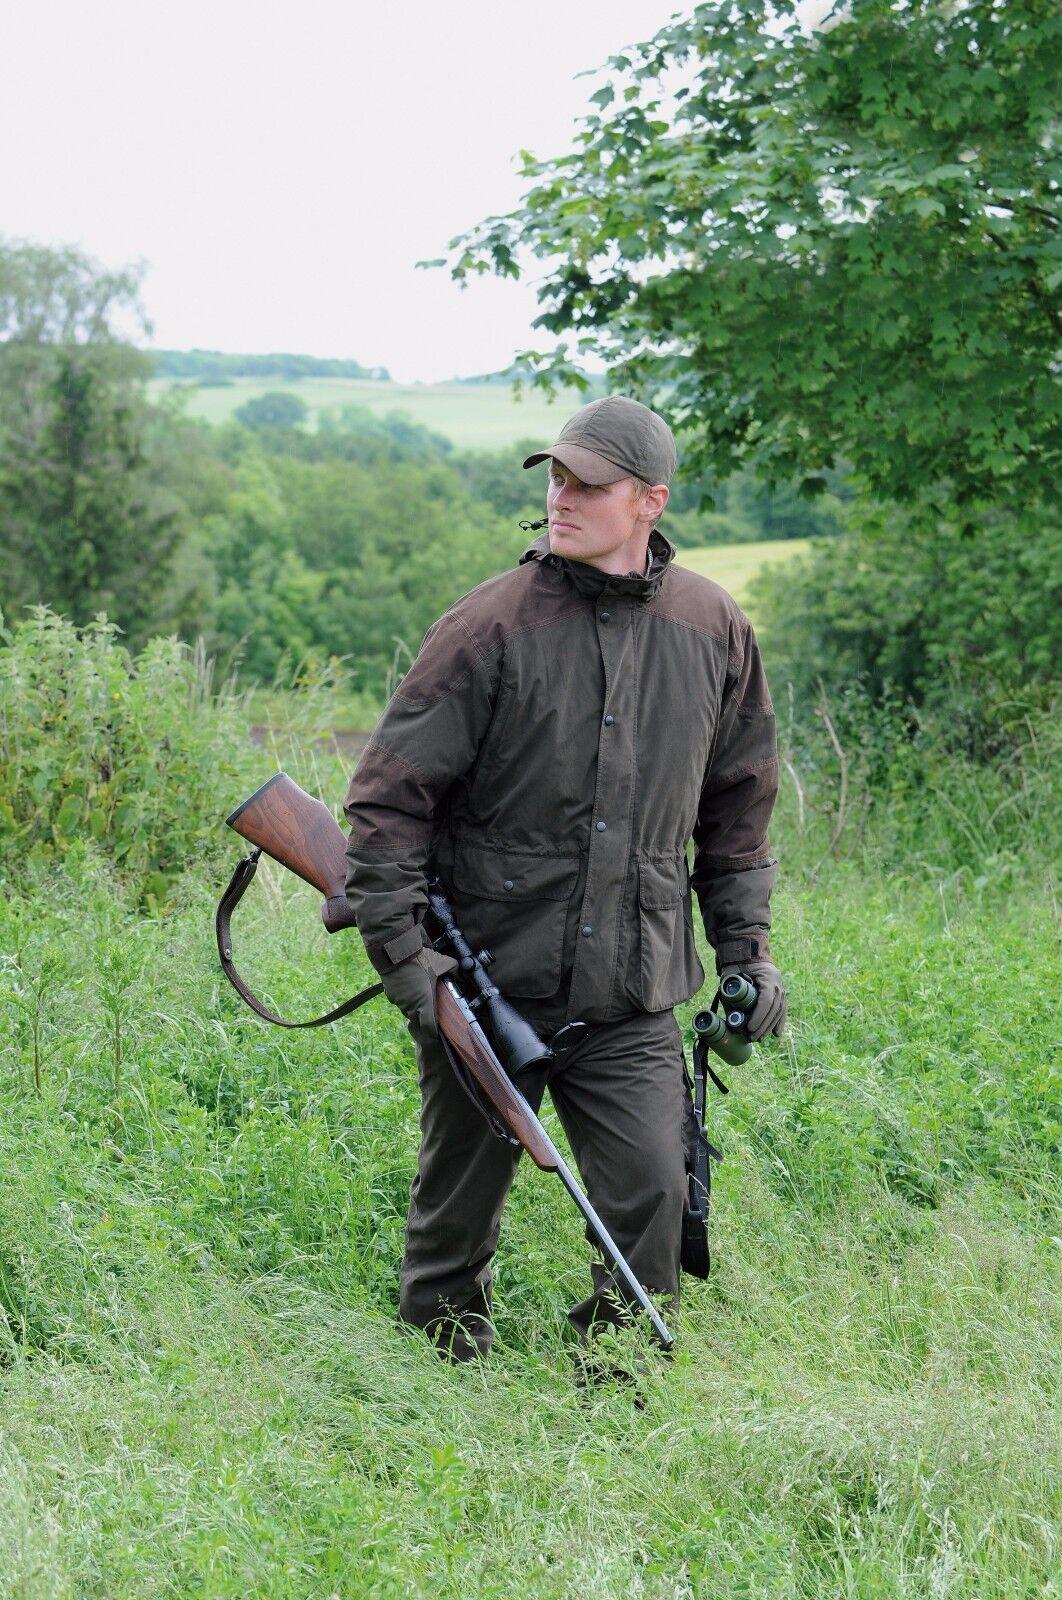 Laksen Para Hombre Chaqueta Impermeable de disparo, acechando Kudu